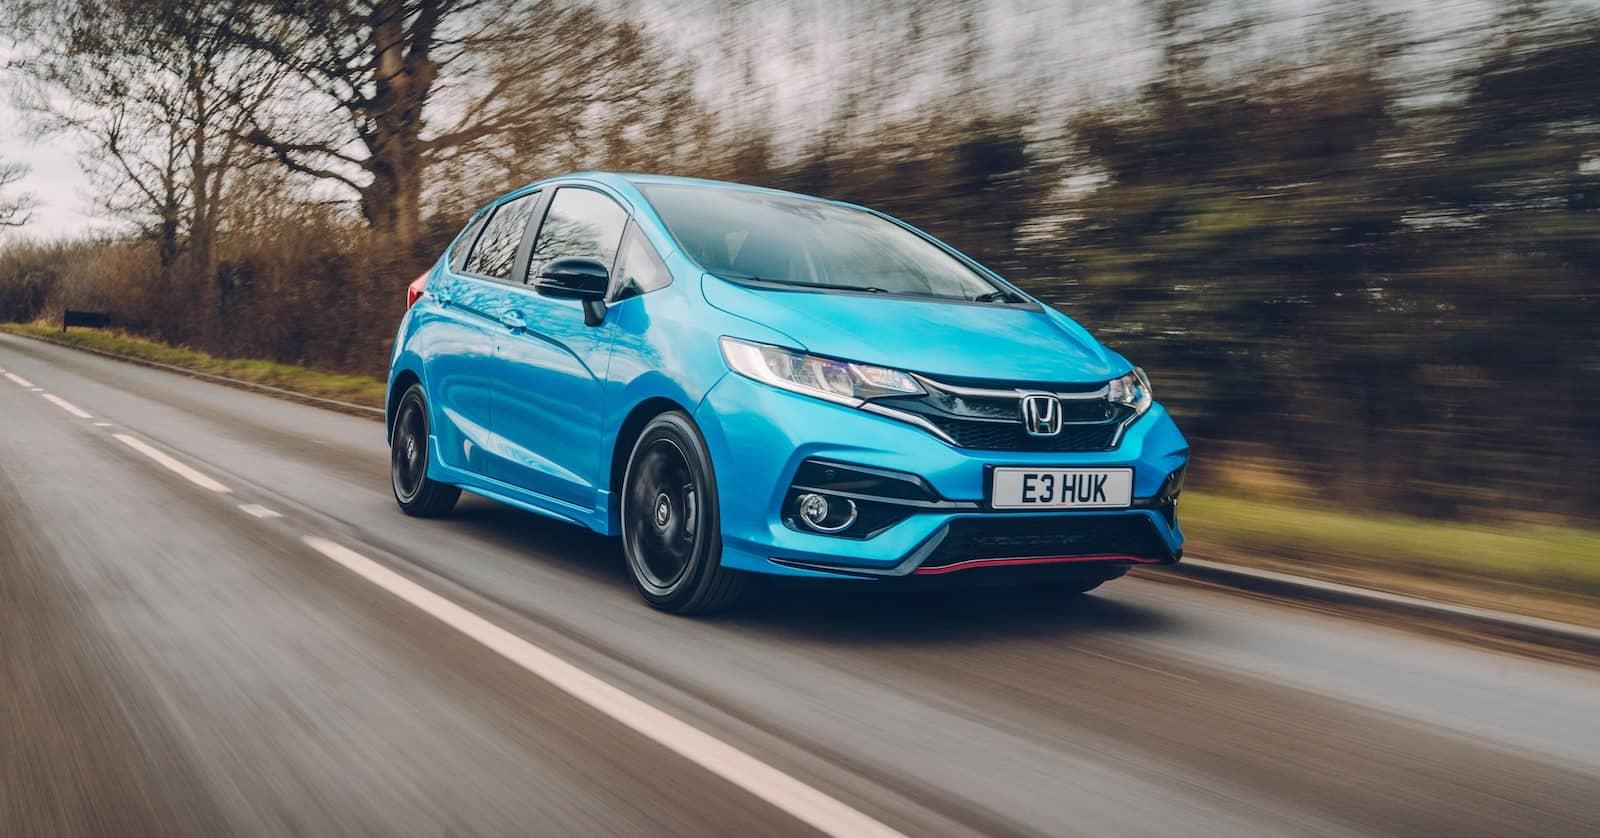 Honda Jazz (2018) new car ratings and reviews   The Car Expert